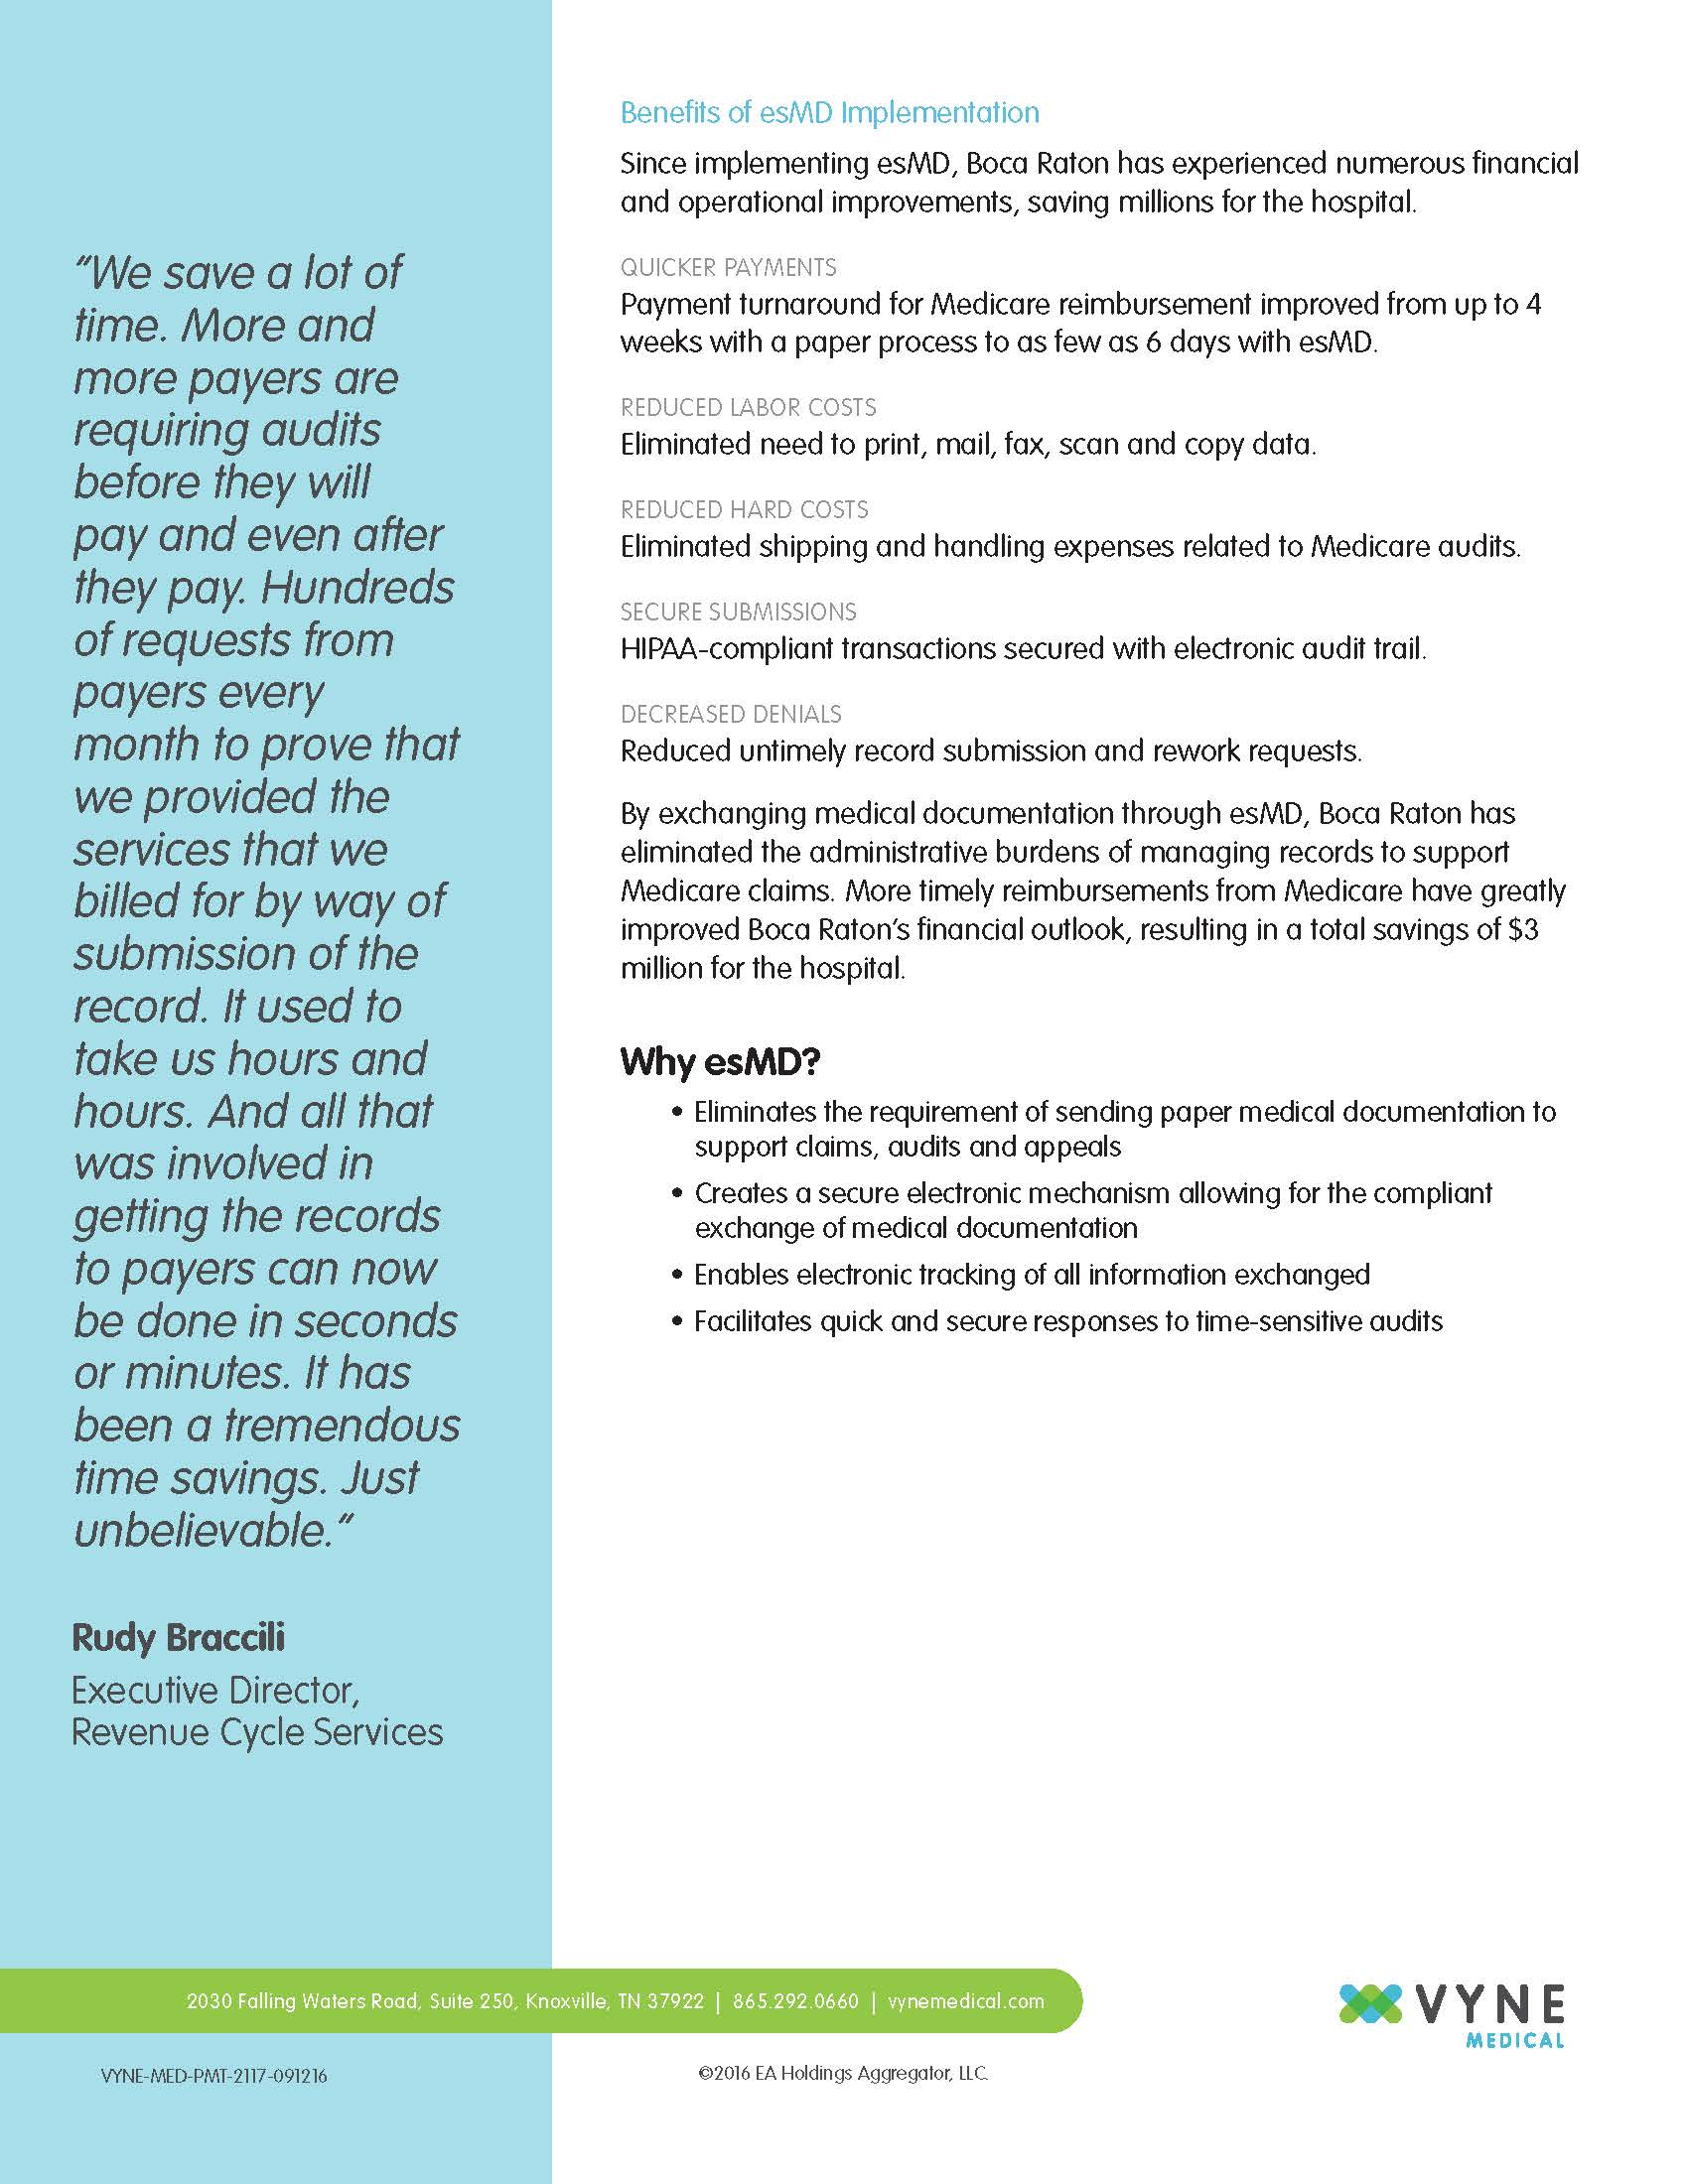 Vyne_Boca Case Study esMD - 090816 (002)_Page_2.jpg